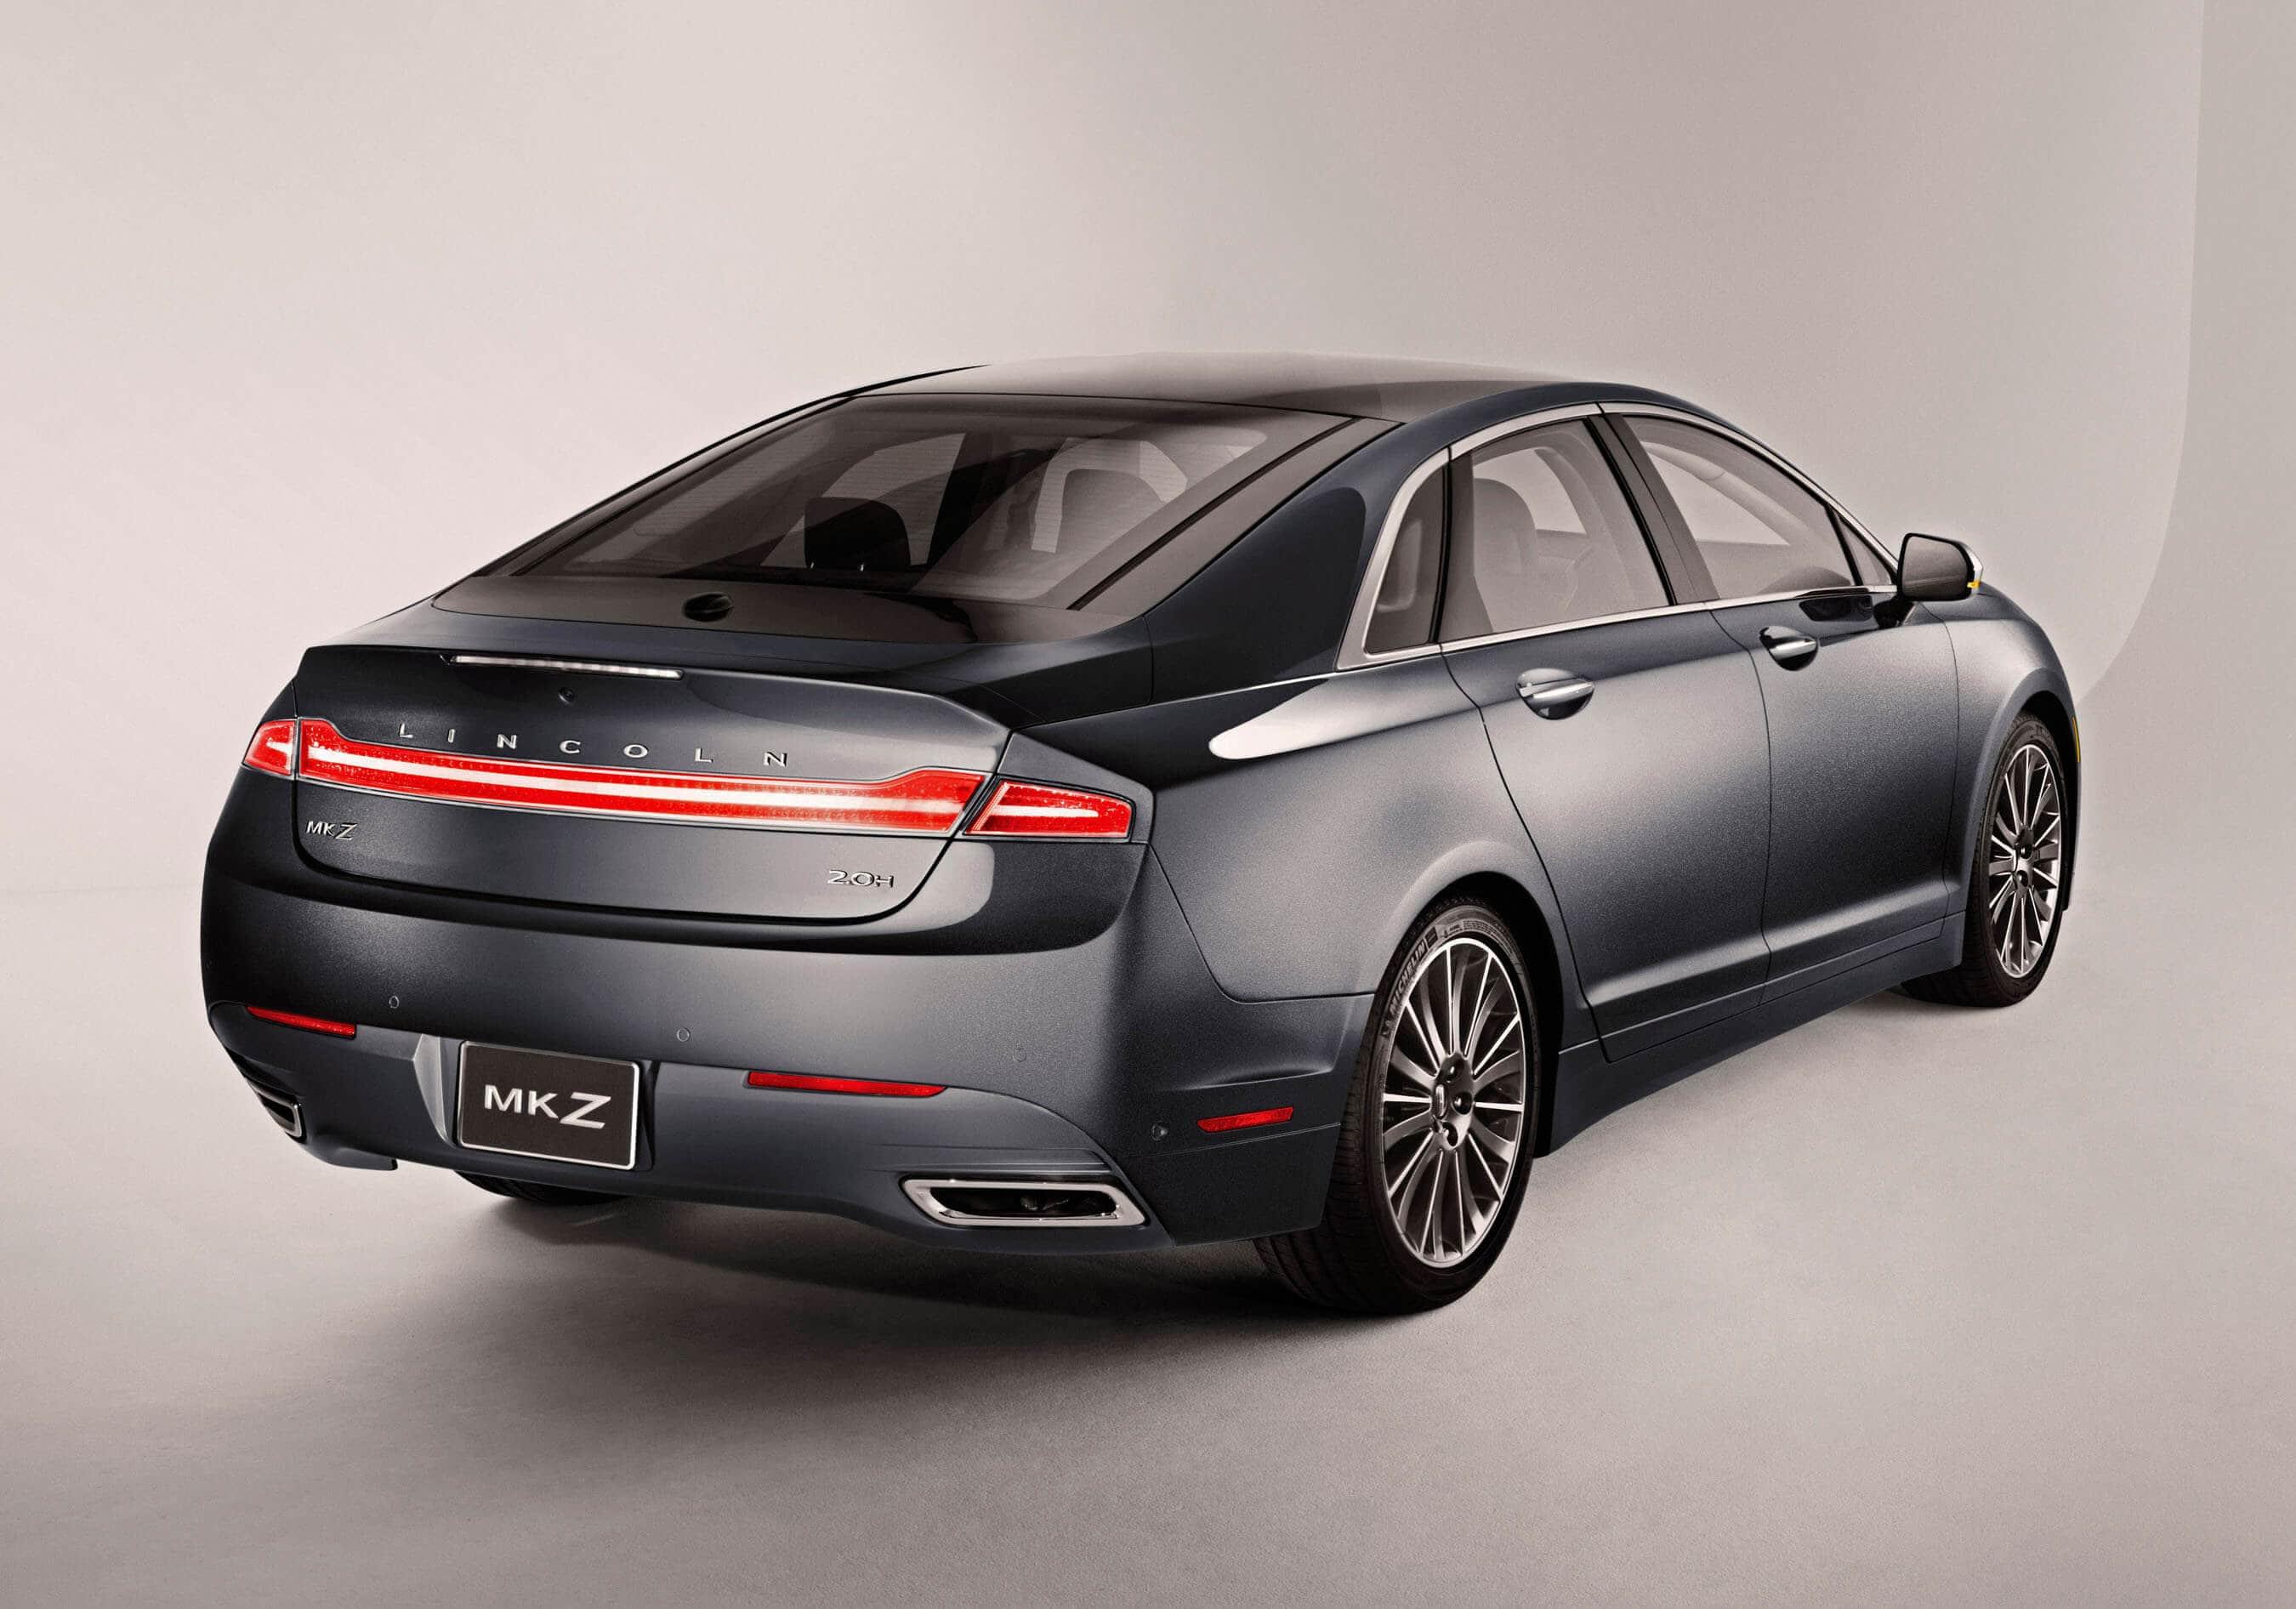 Most Fuel Efficient Luxury Hybrid Car Lincoln Mkz Hybrid Greener Ideal